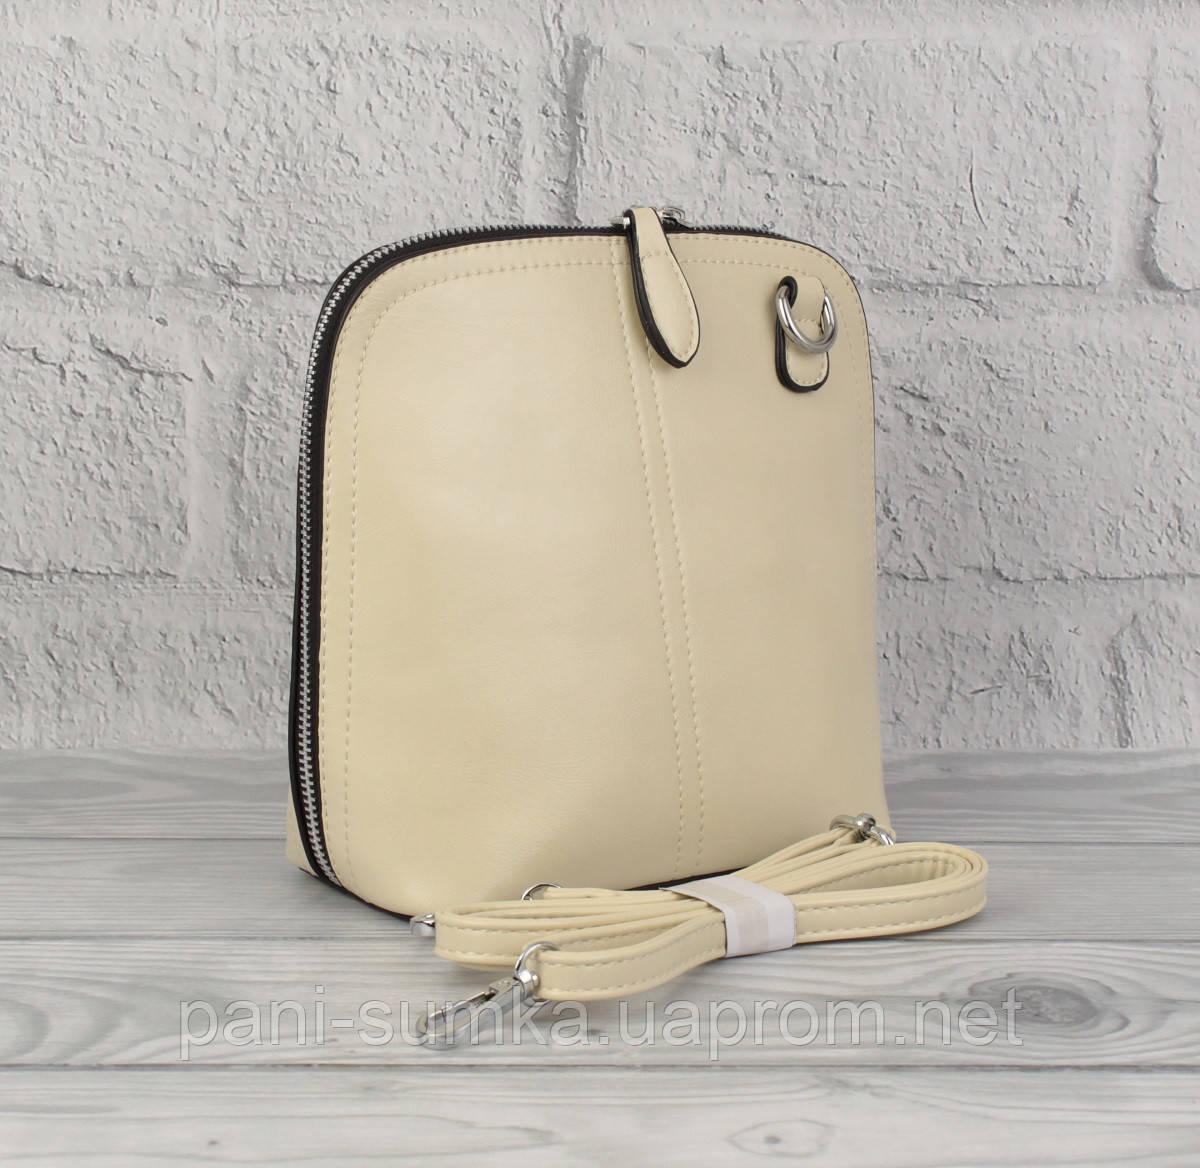 Клатч, сумочка через плечо Bl. Balli 1127-67 светло-бежевая